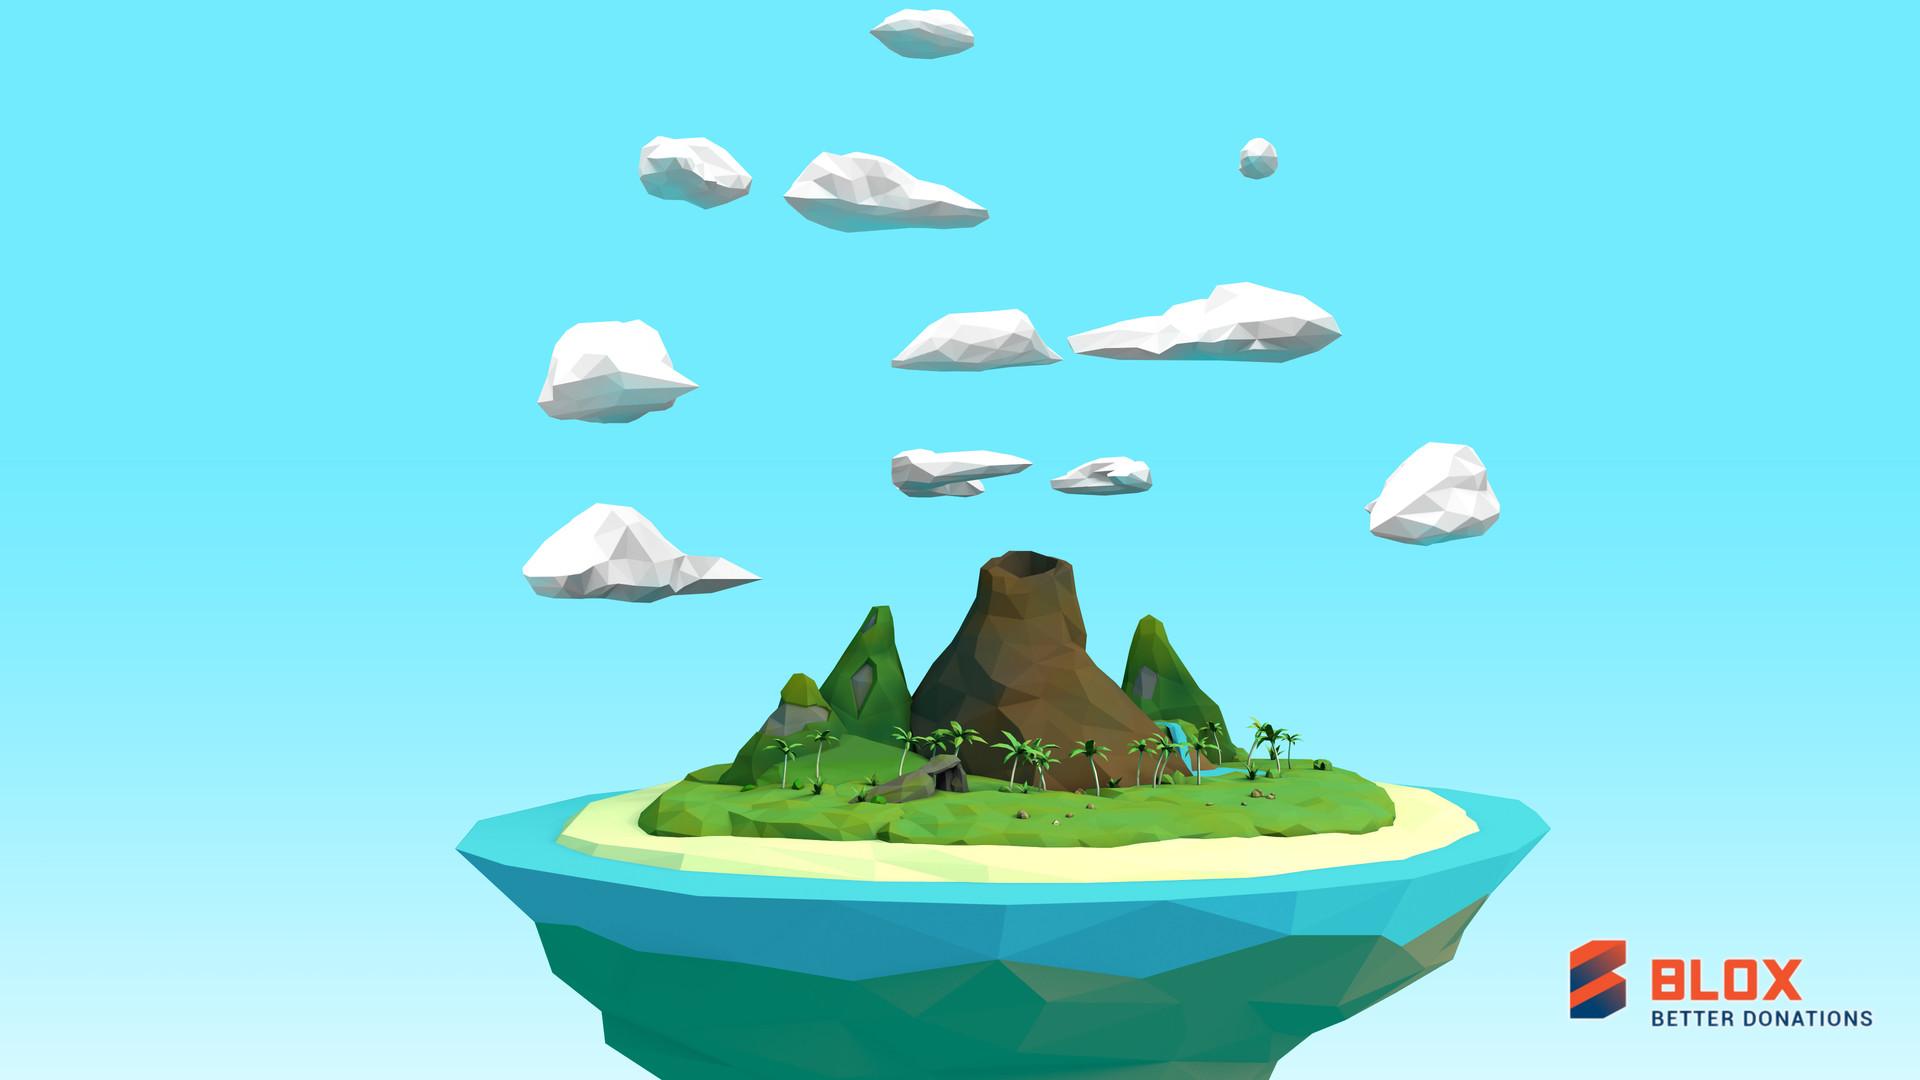 Matthew ramirez blox island 002